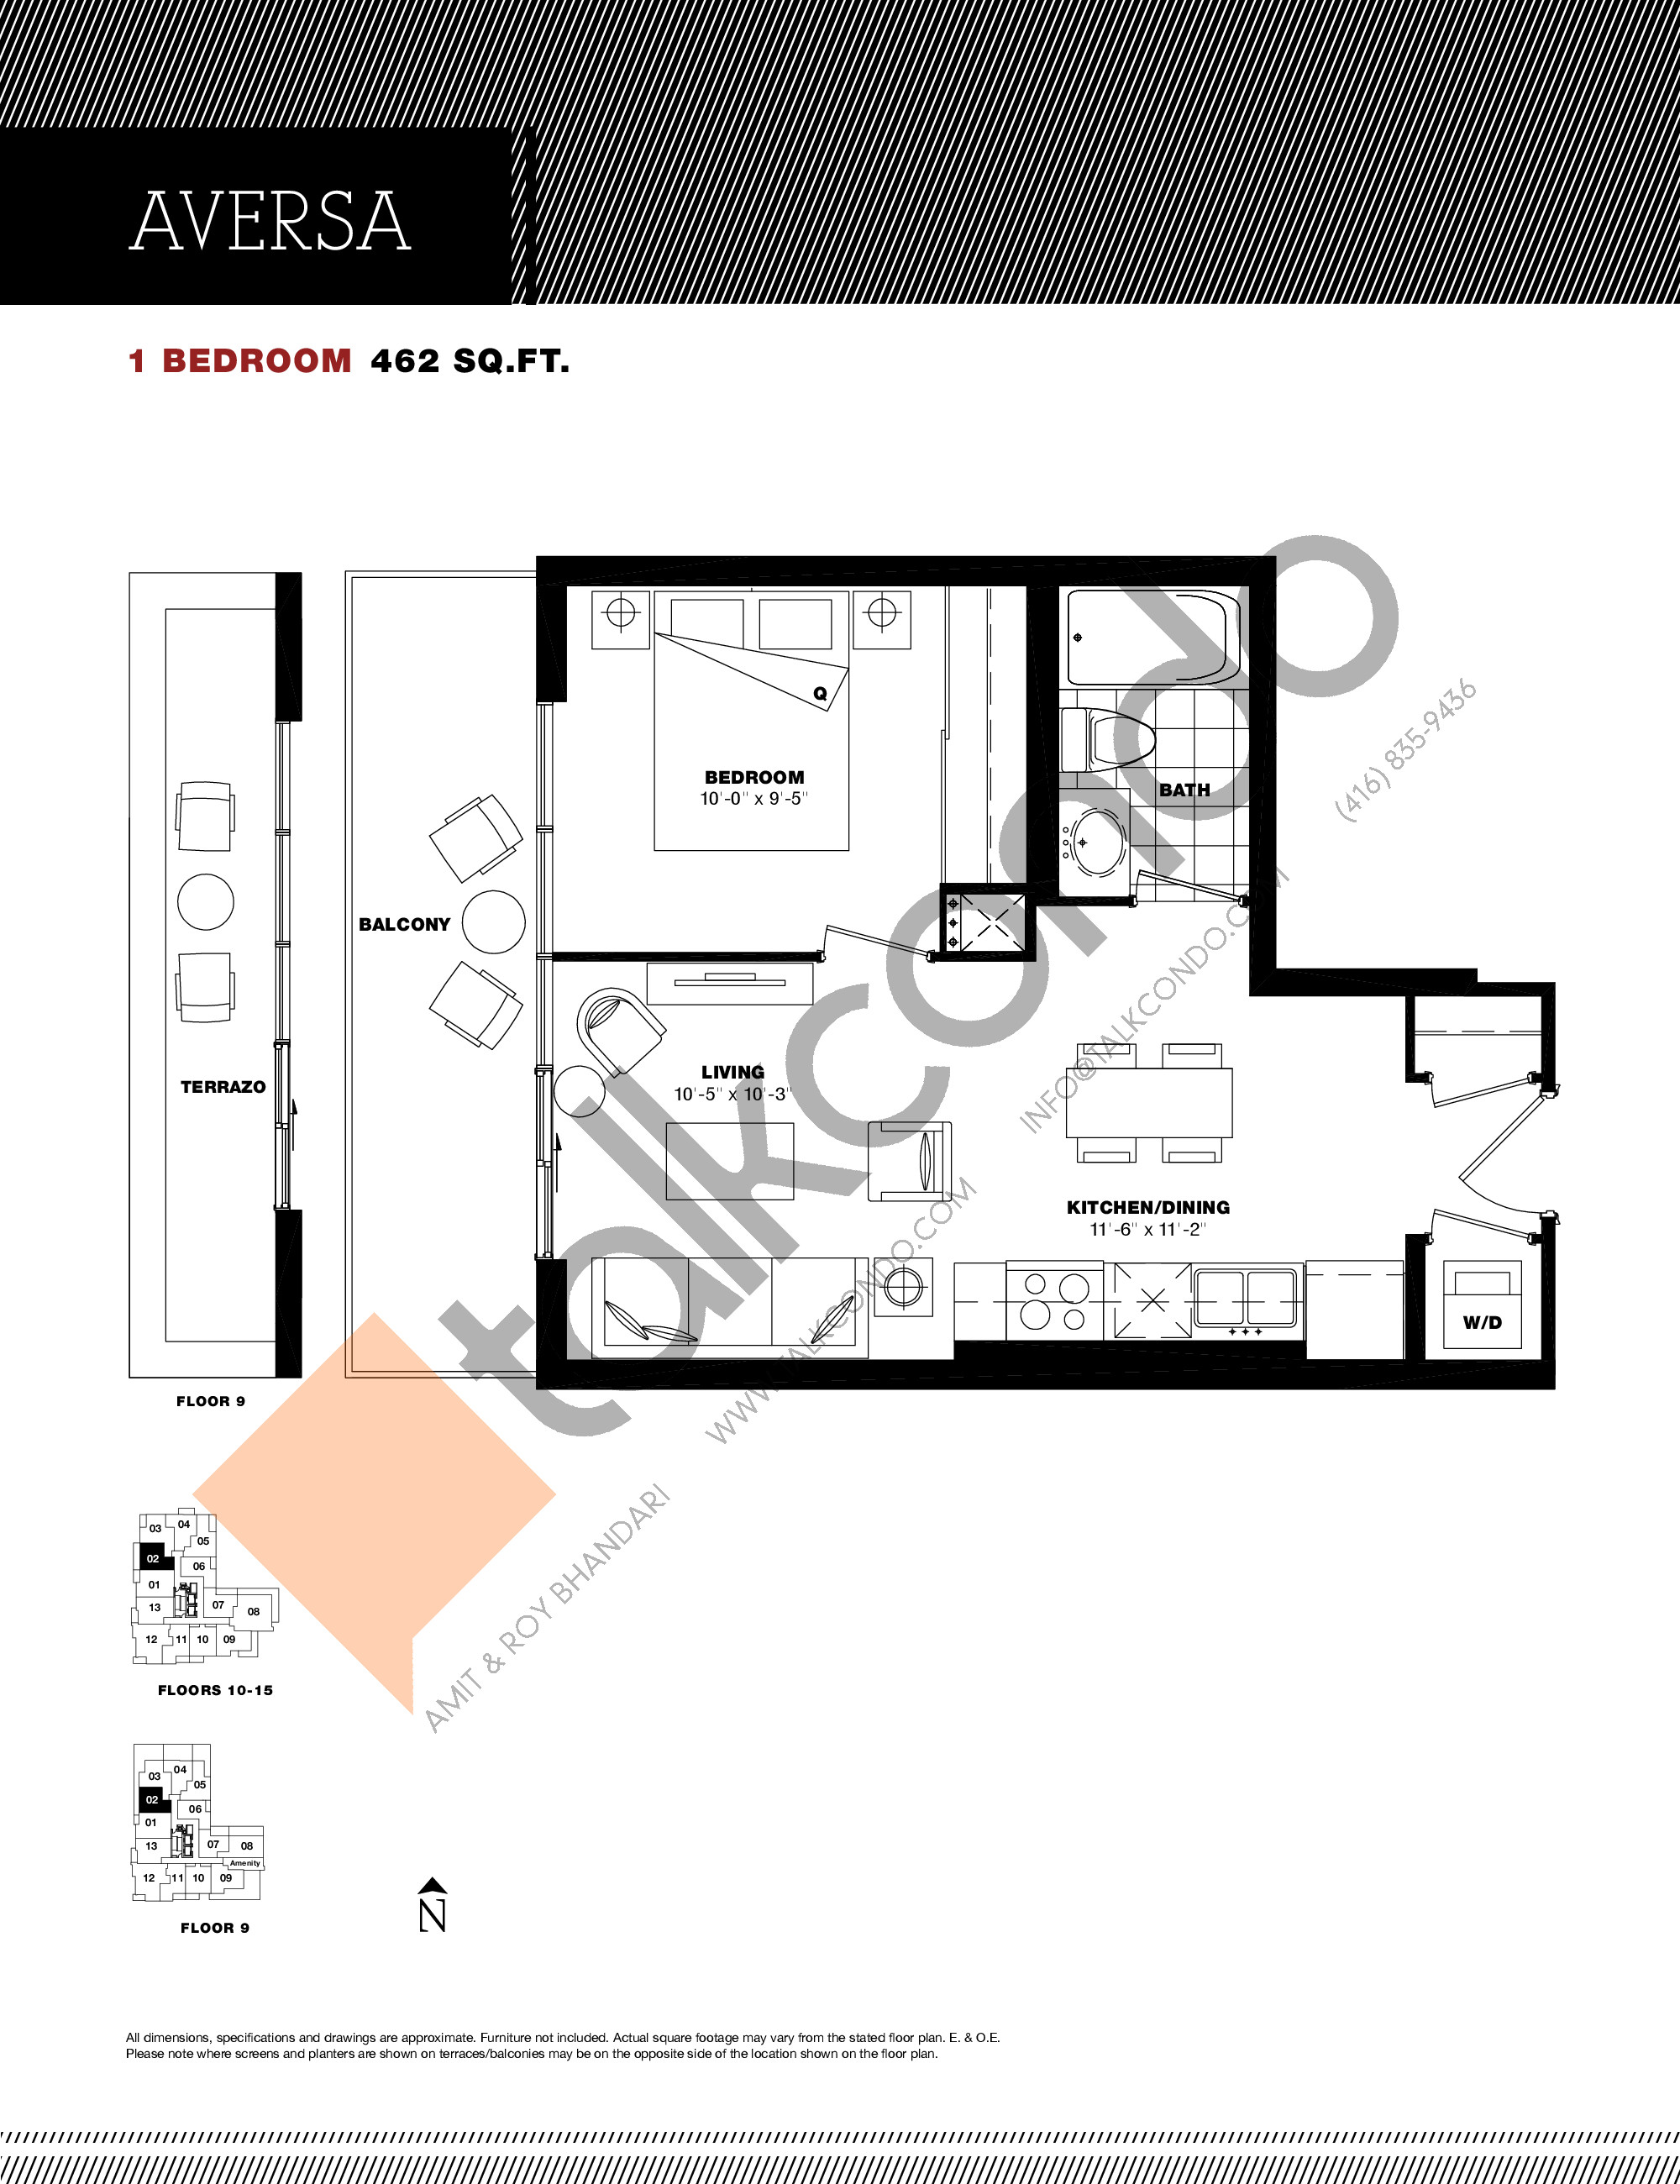 Aversa Floor Plan at Residenze Palazzo at Treviso 3 Condos - 462 sq.ft